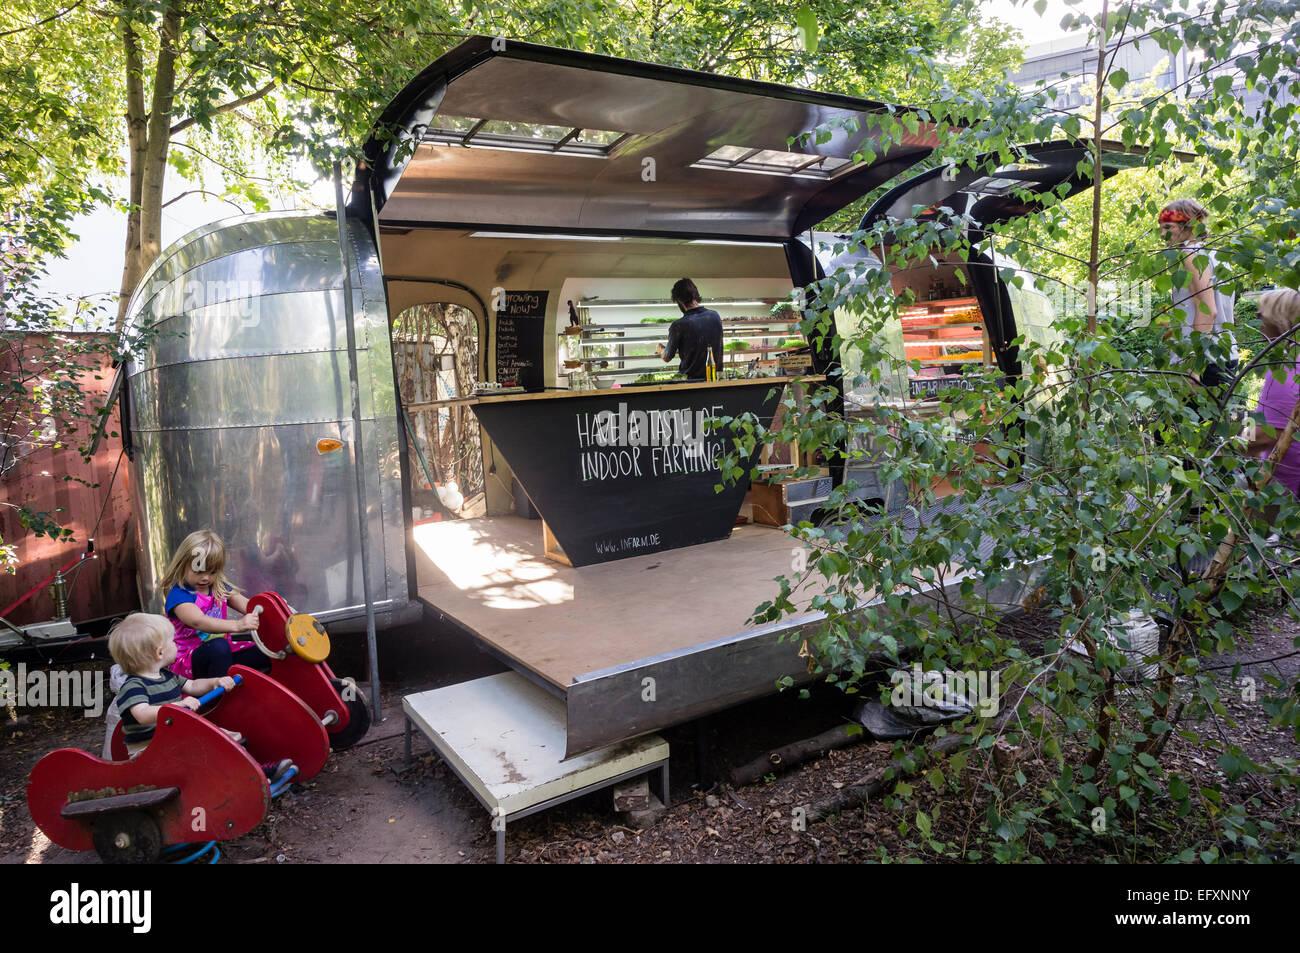 Princess Garden , Urban Gardening,  mobile urban farm with herbs and vegatable, Kreuzberg, Berlin - Stock Image